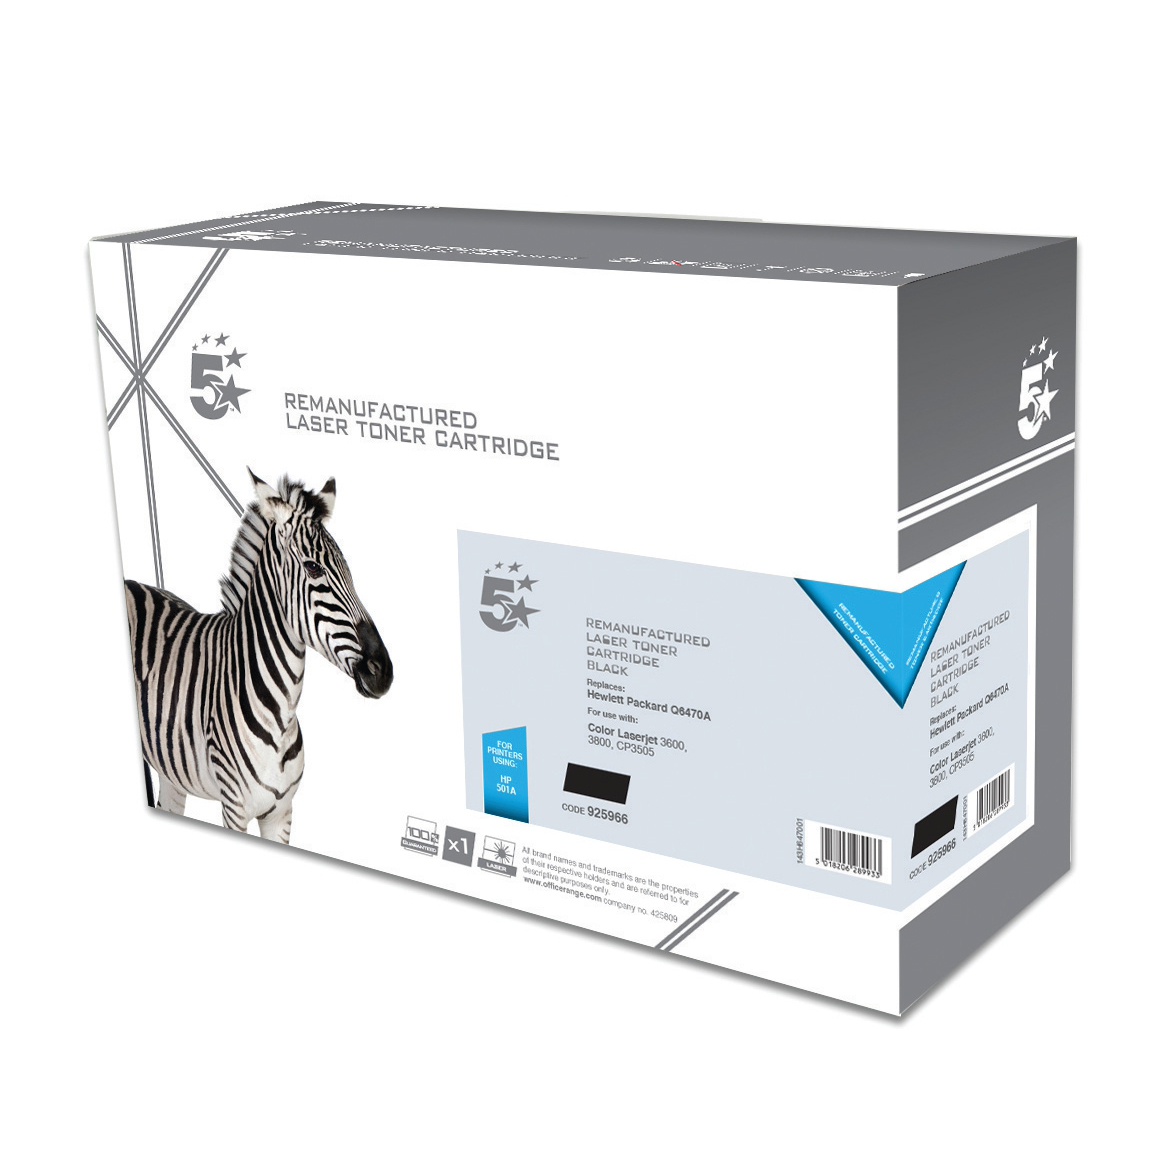 5 Star Office Remanufactured Laser Toner Cartridge 6000pp Black [HP 501A Q6470A Alternative]